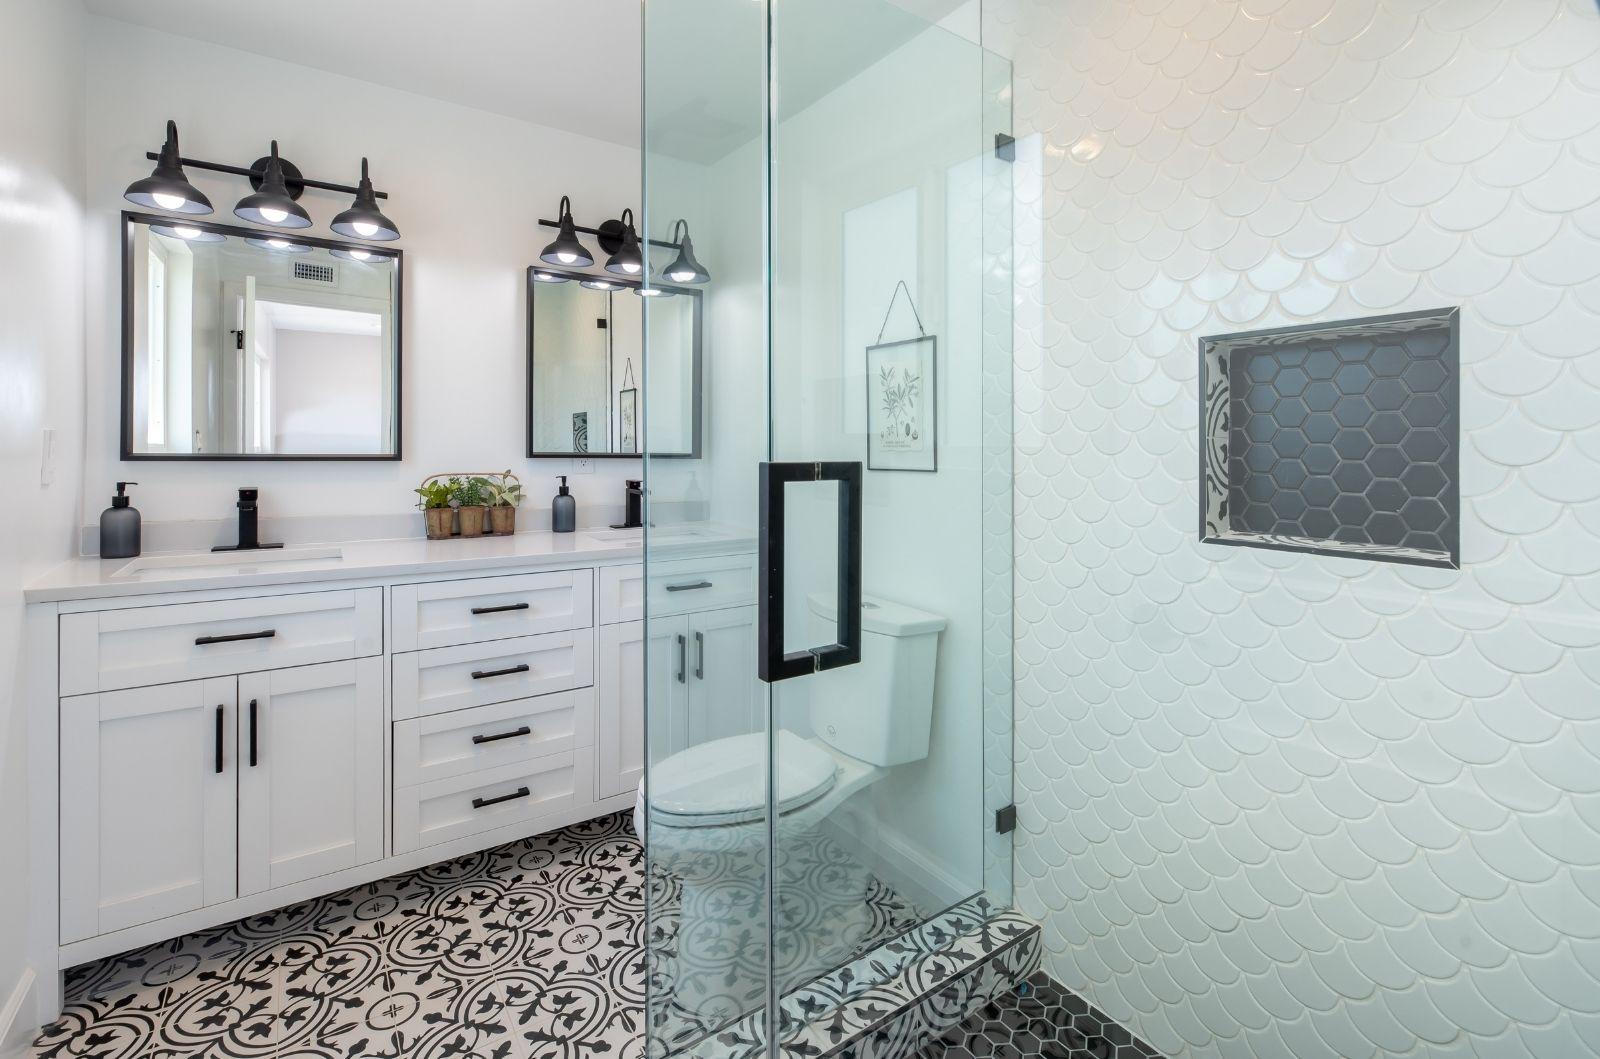 Bathroom Remodeling Miami FL ⋆ Premier Remodeling